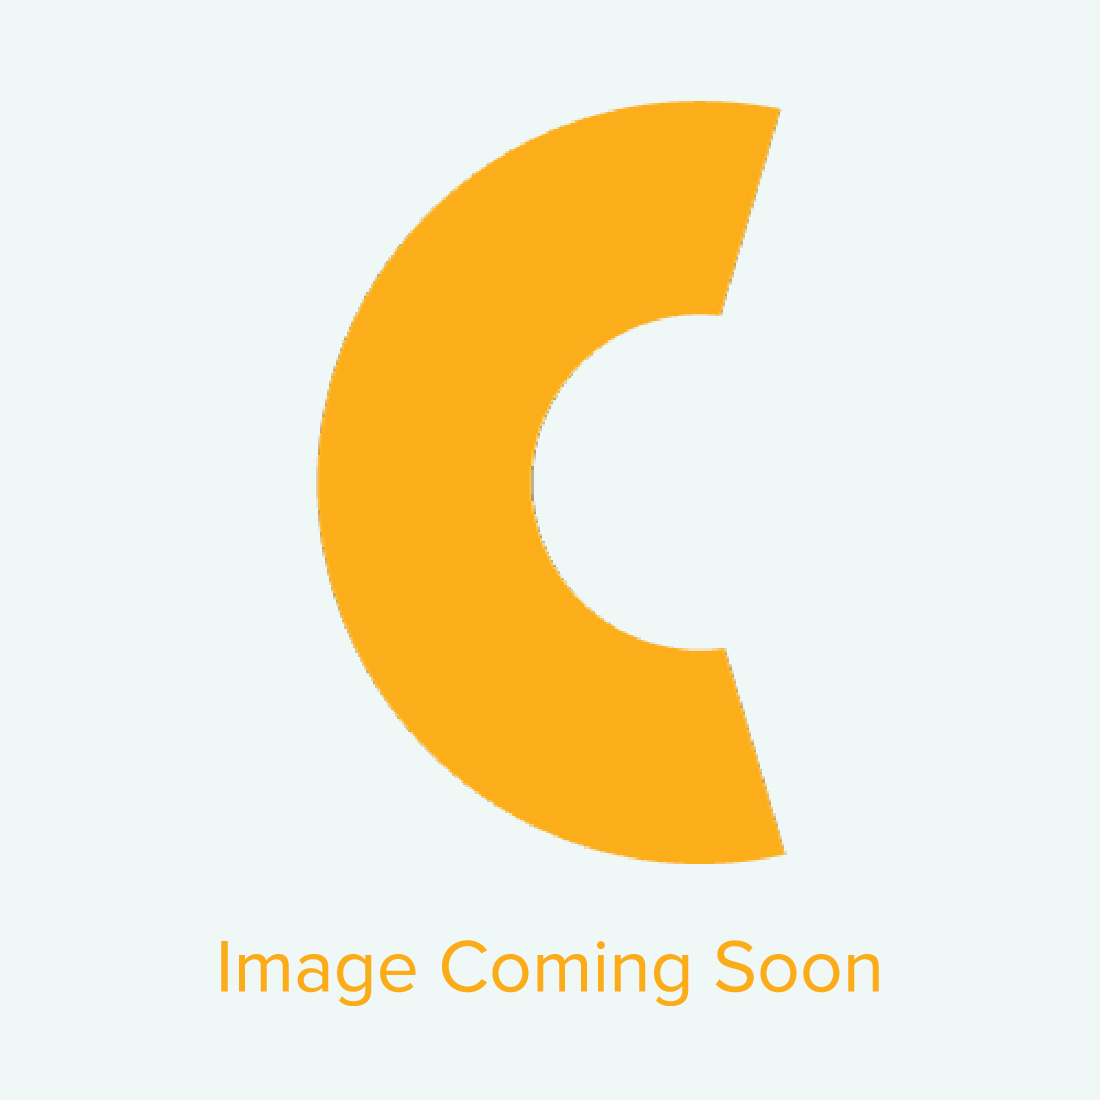 "5"" x 7"" ChromaLuxe Hardboard Photo Print Panel with Easel"